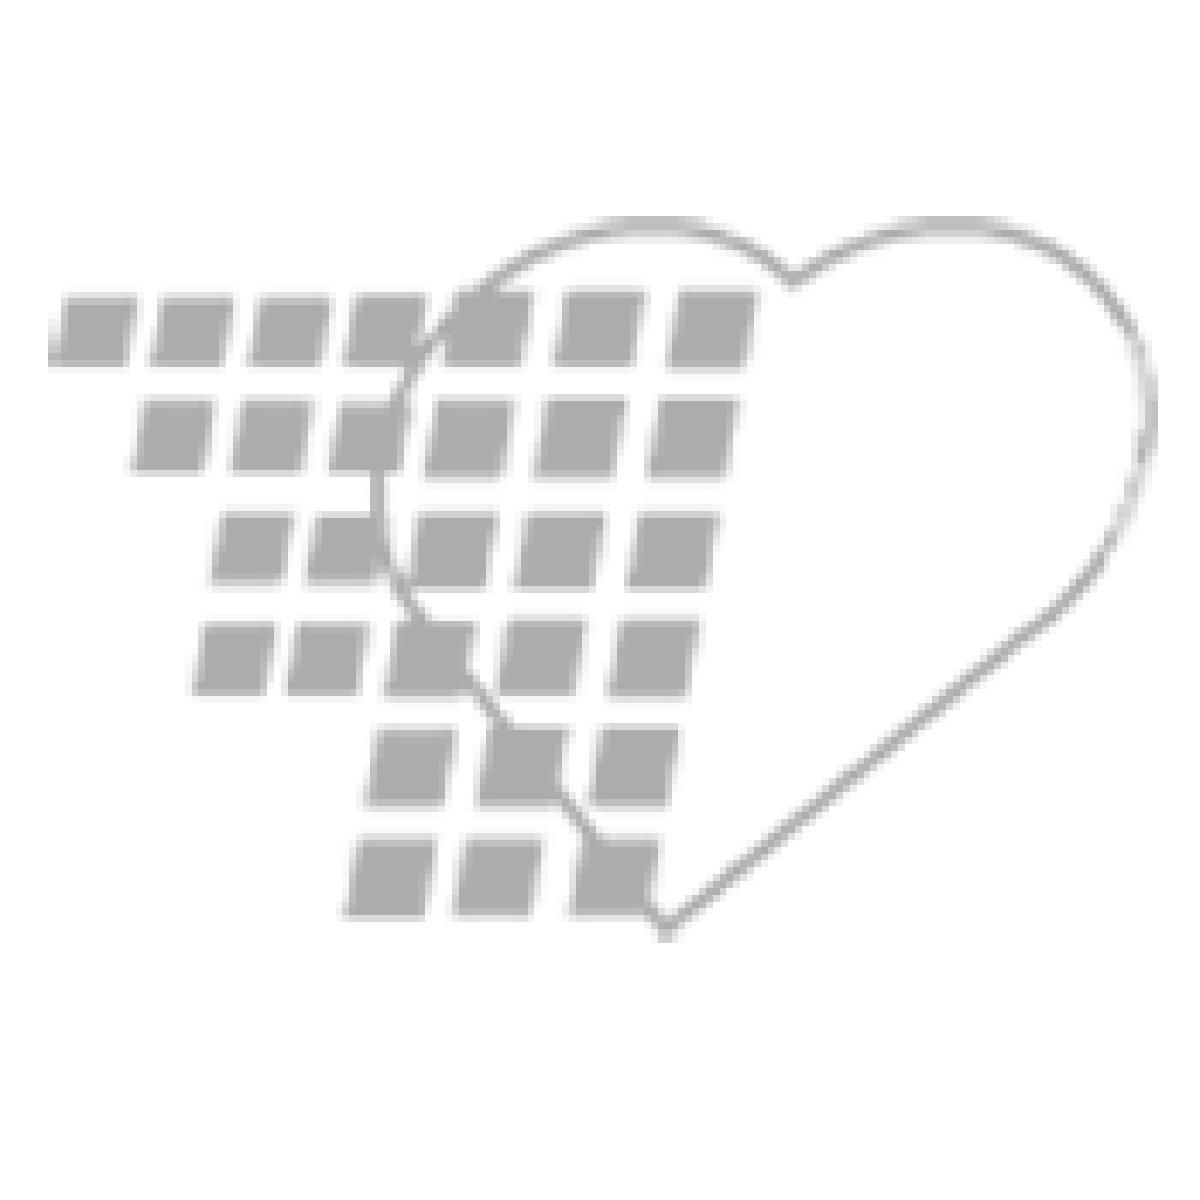 11-81-8005 KbPort Carry Case for ETC FusionHD for SimPad PLUS